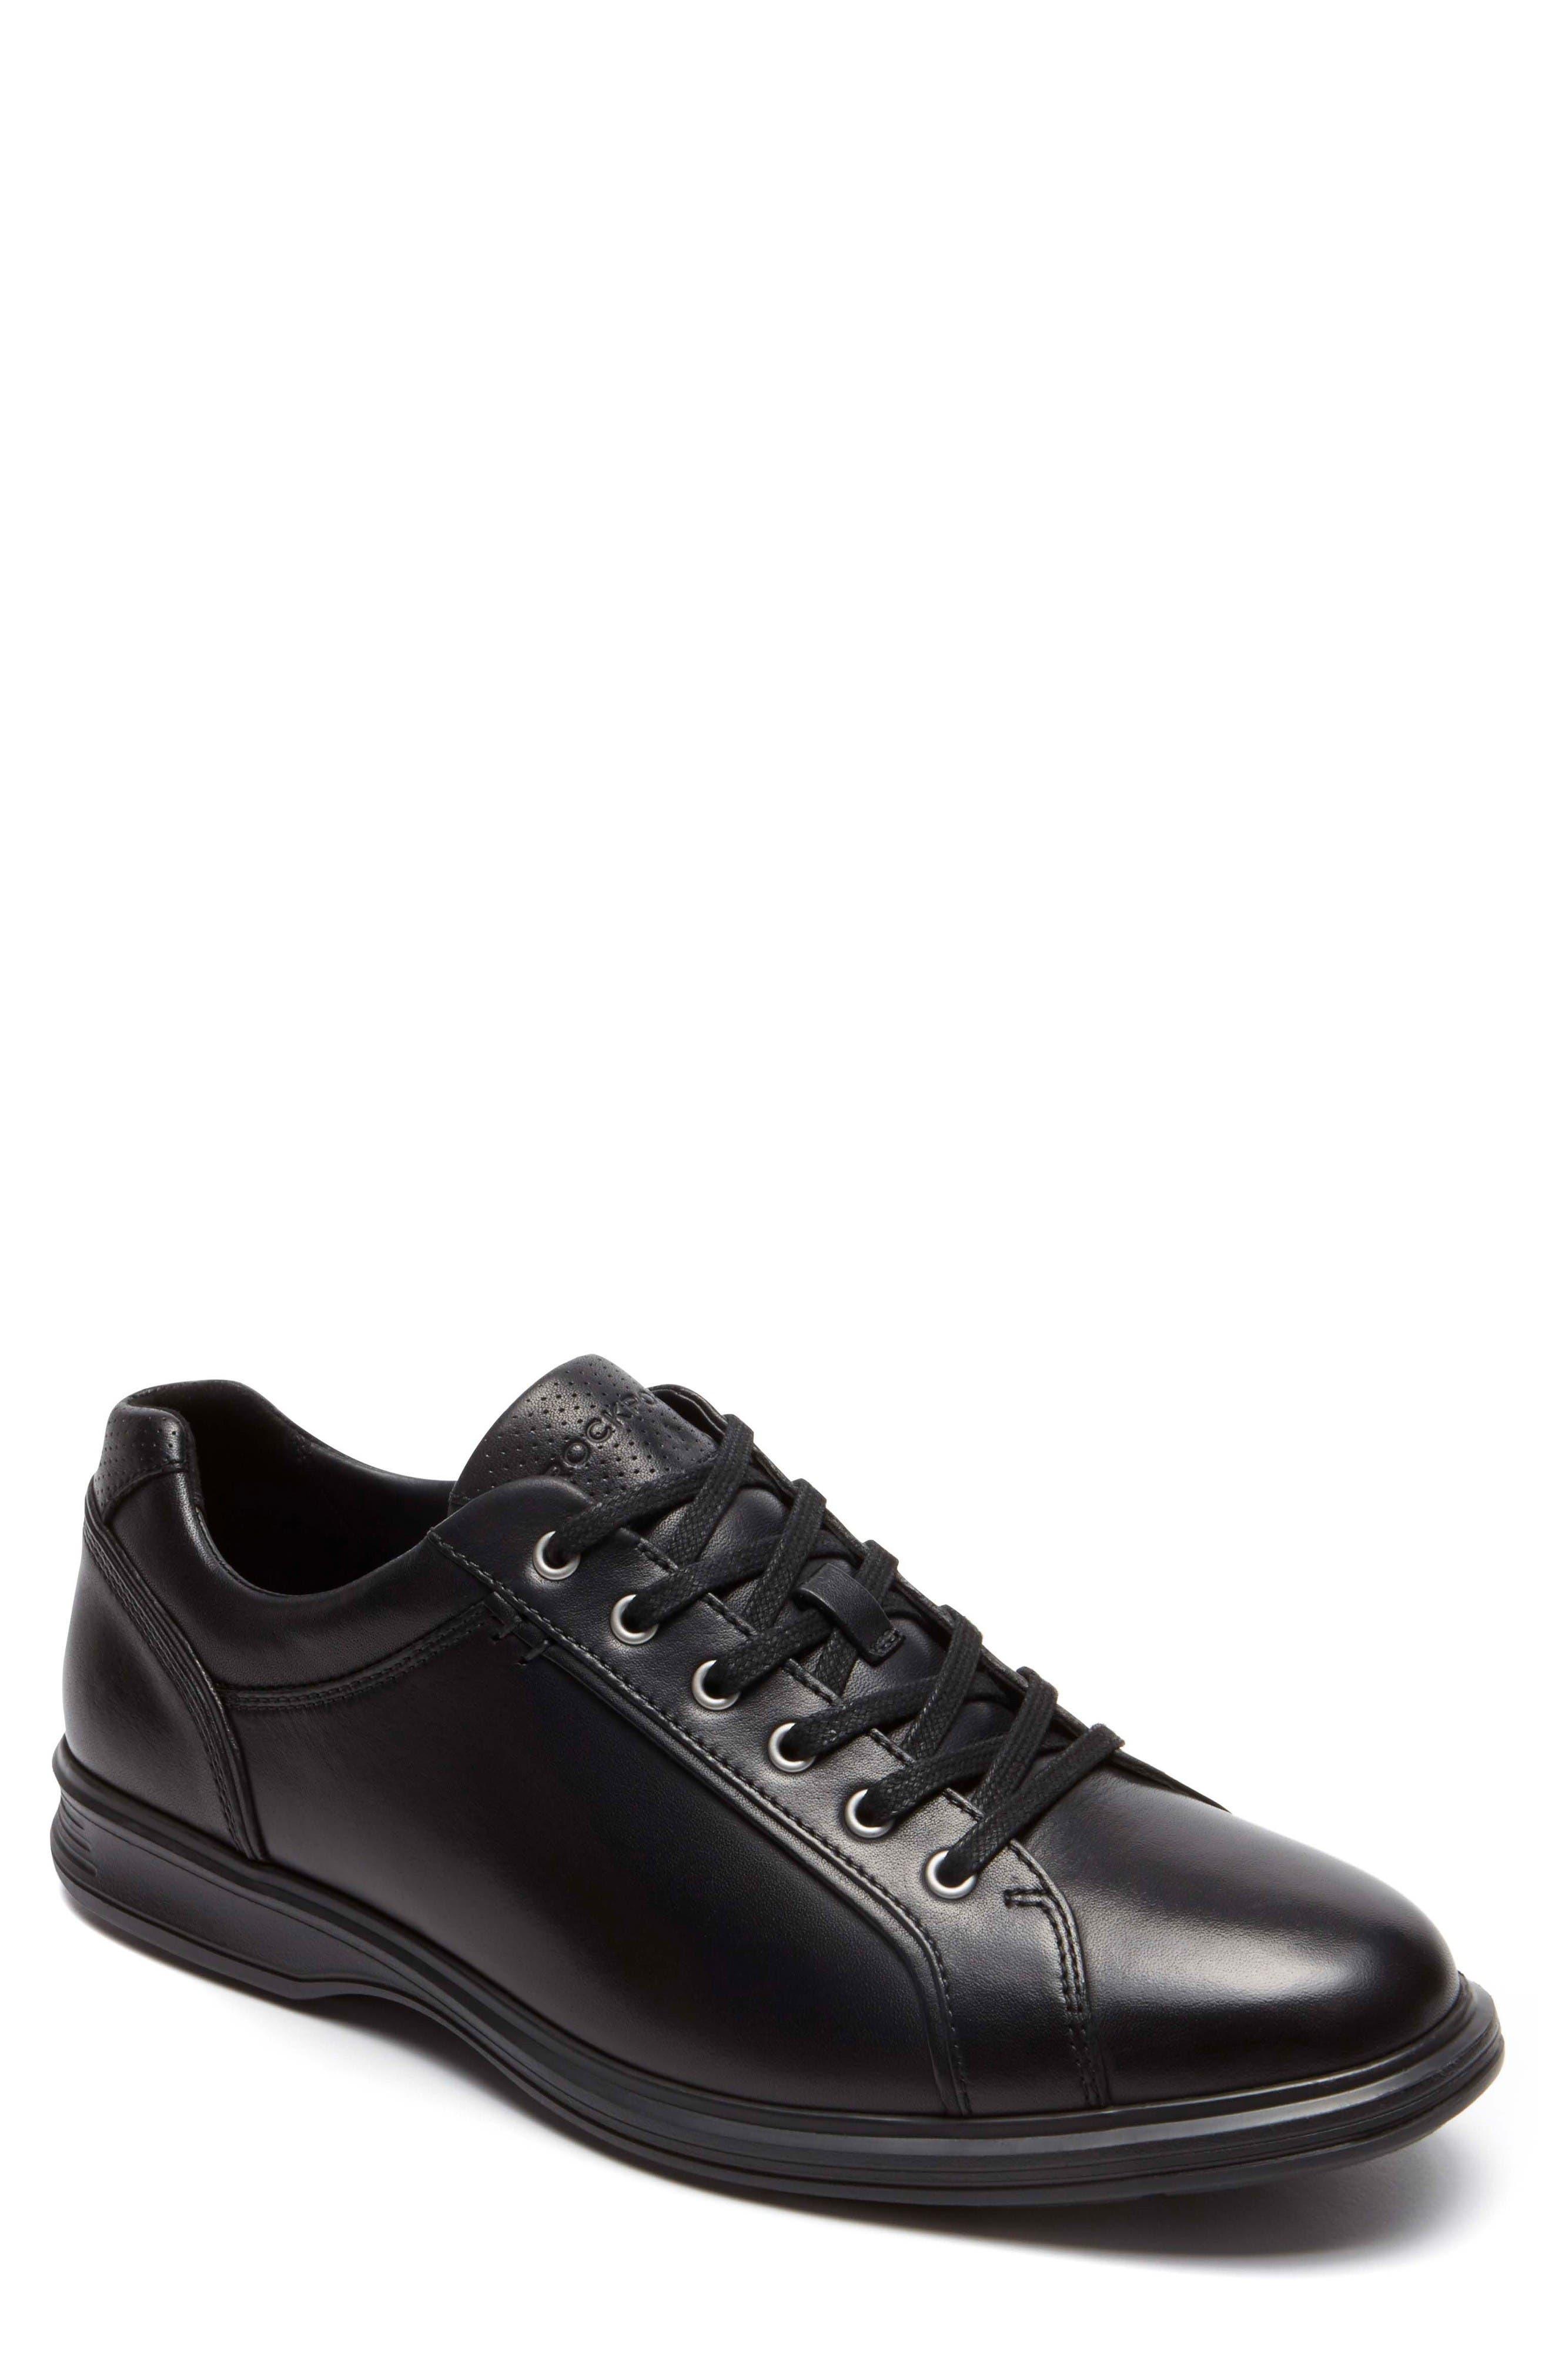 Dressports 2 Lite Plain Toe Derby,                         Main,                         color, Black 2 Leather